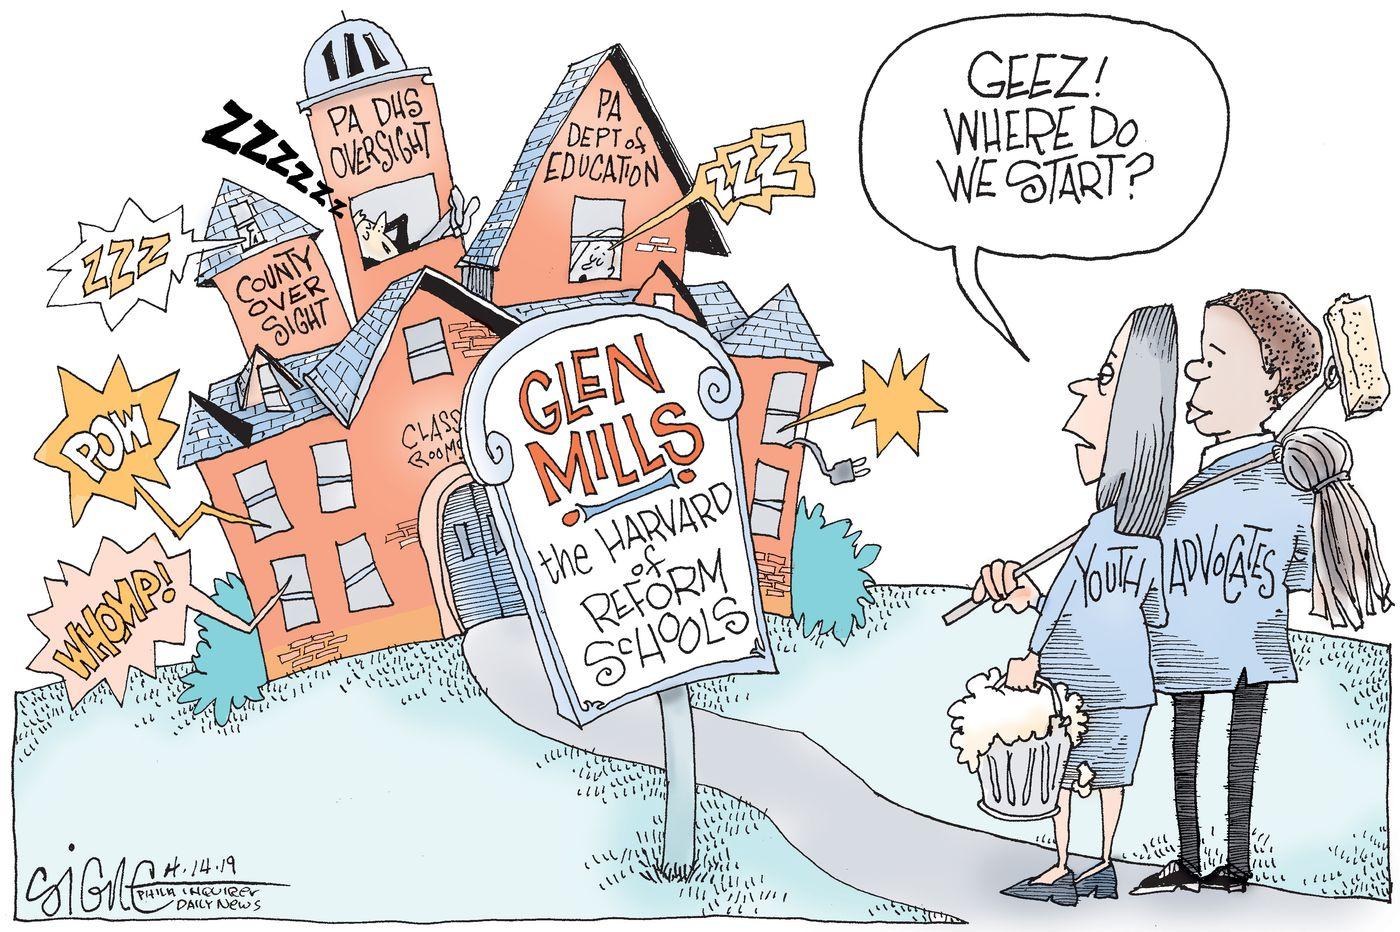 Political Cartoon: Glen Mills clean up